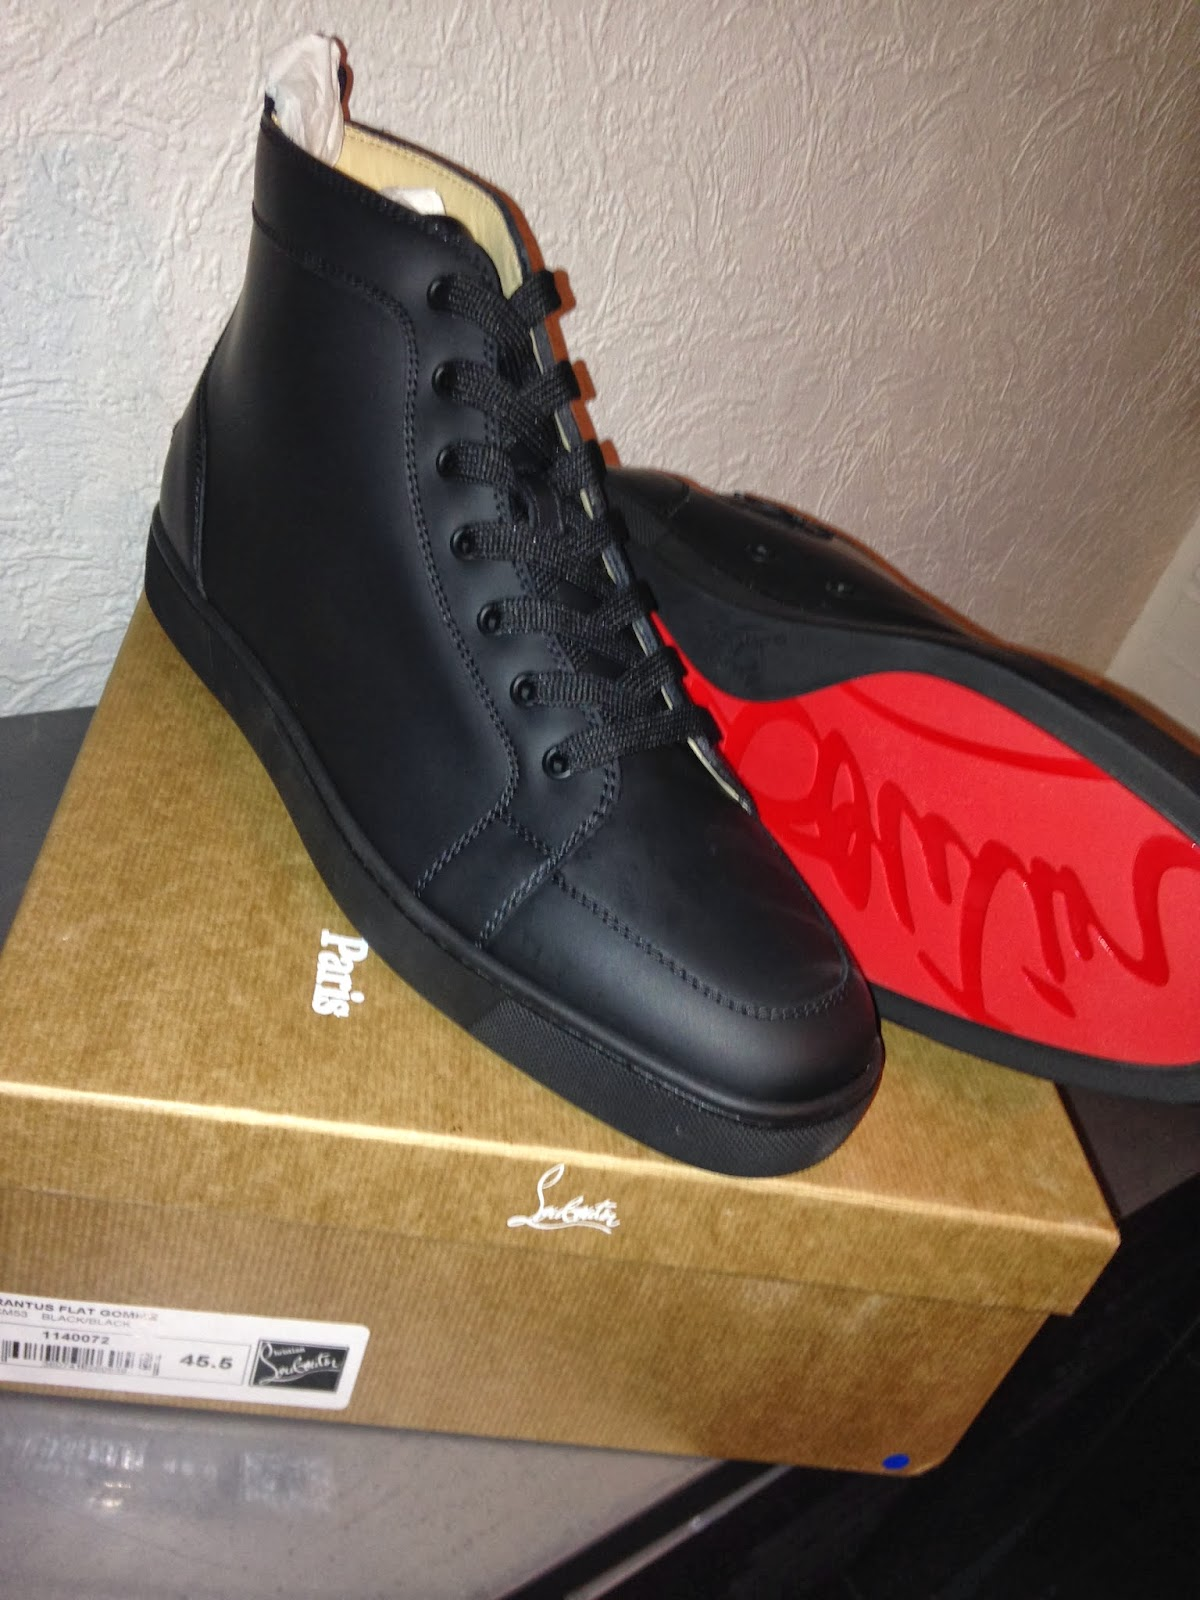 Tellement Lui My Style Sneakers Christian Louboutin Mes Nouveaux B B S